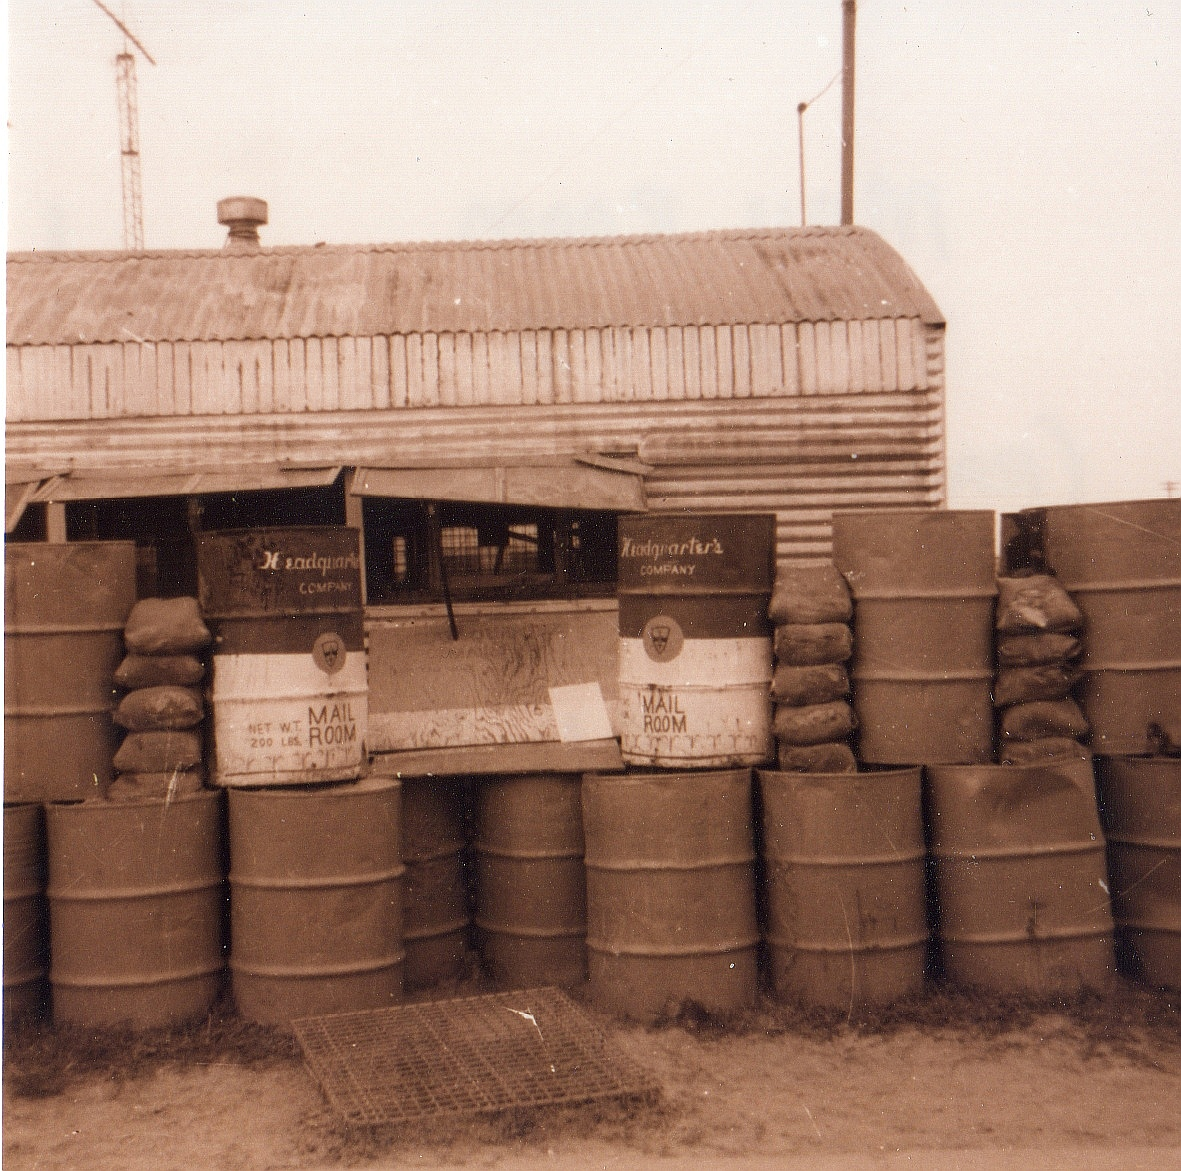 Mail Room, 8th RRFS, Phu Bai 1970